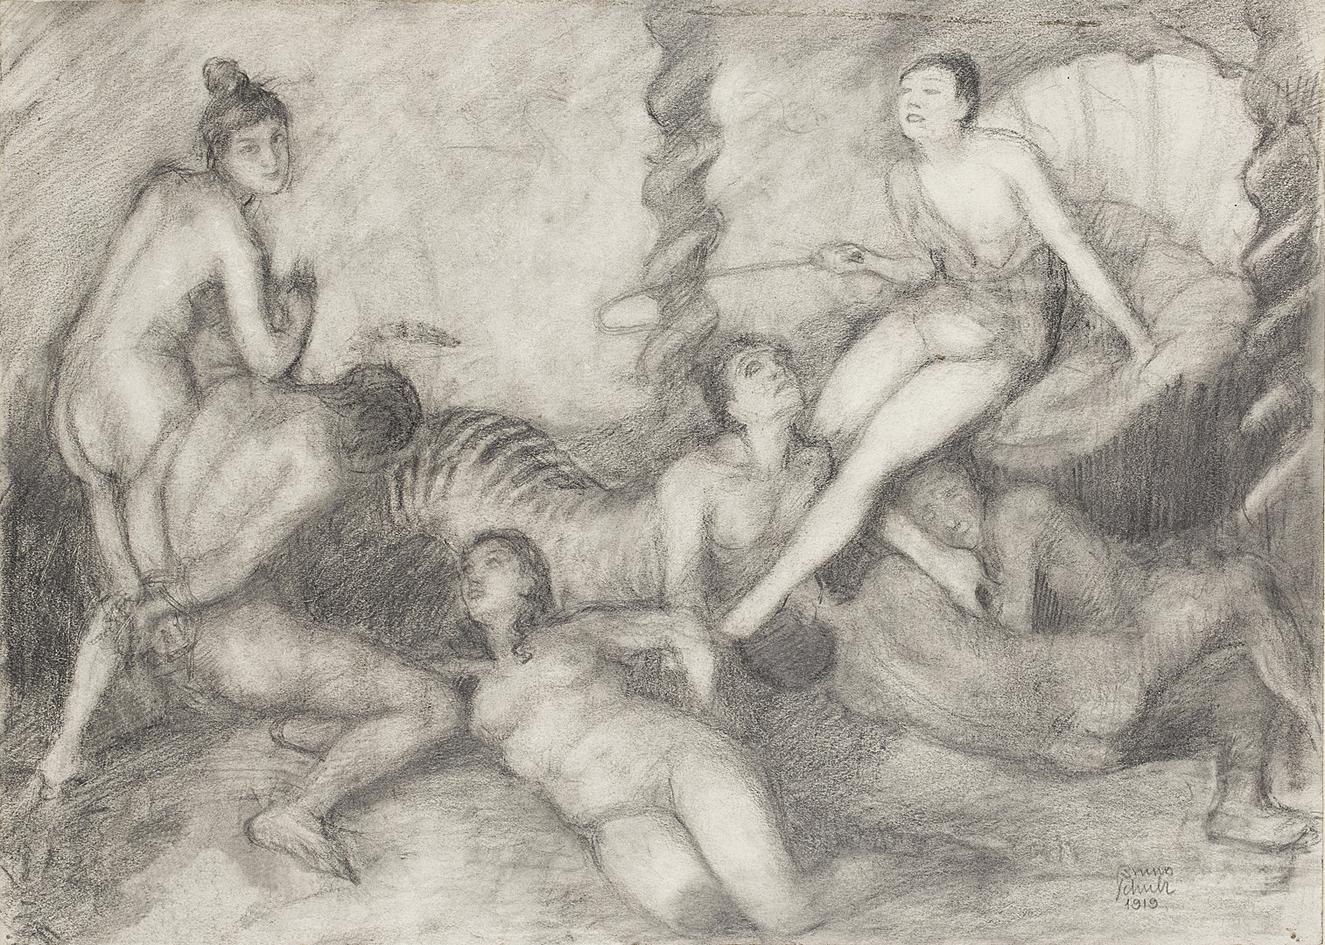 Бруно Шульц. Жінки-садистки, 1919; папір, олівець; JHI